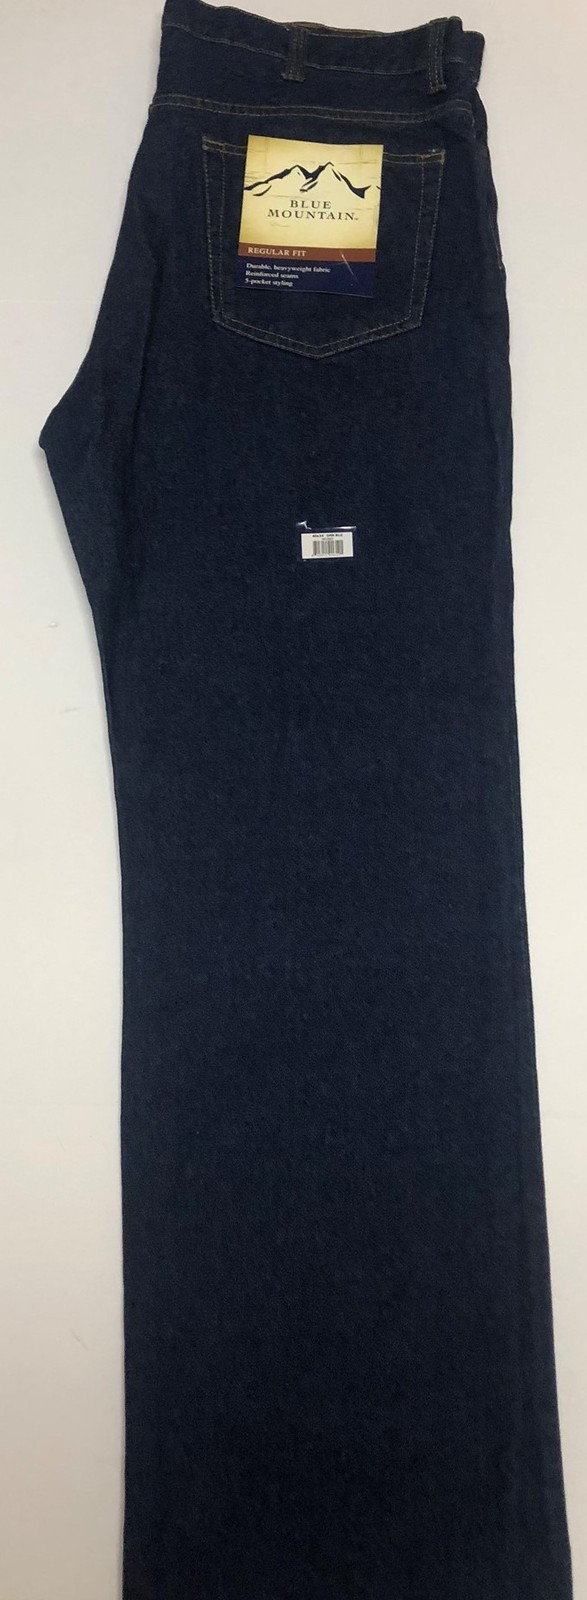 Blue Mountain Jeans Regular Fit 5 Pocket Heavyweight Sz 40 x 34 image 3